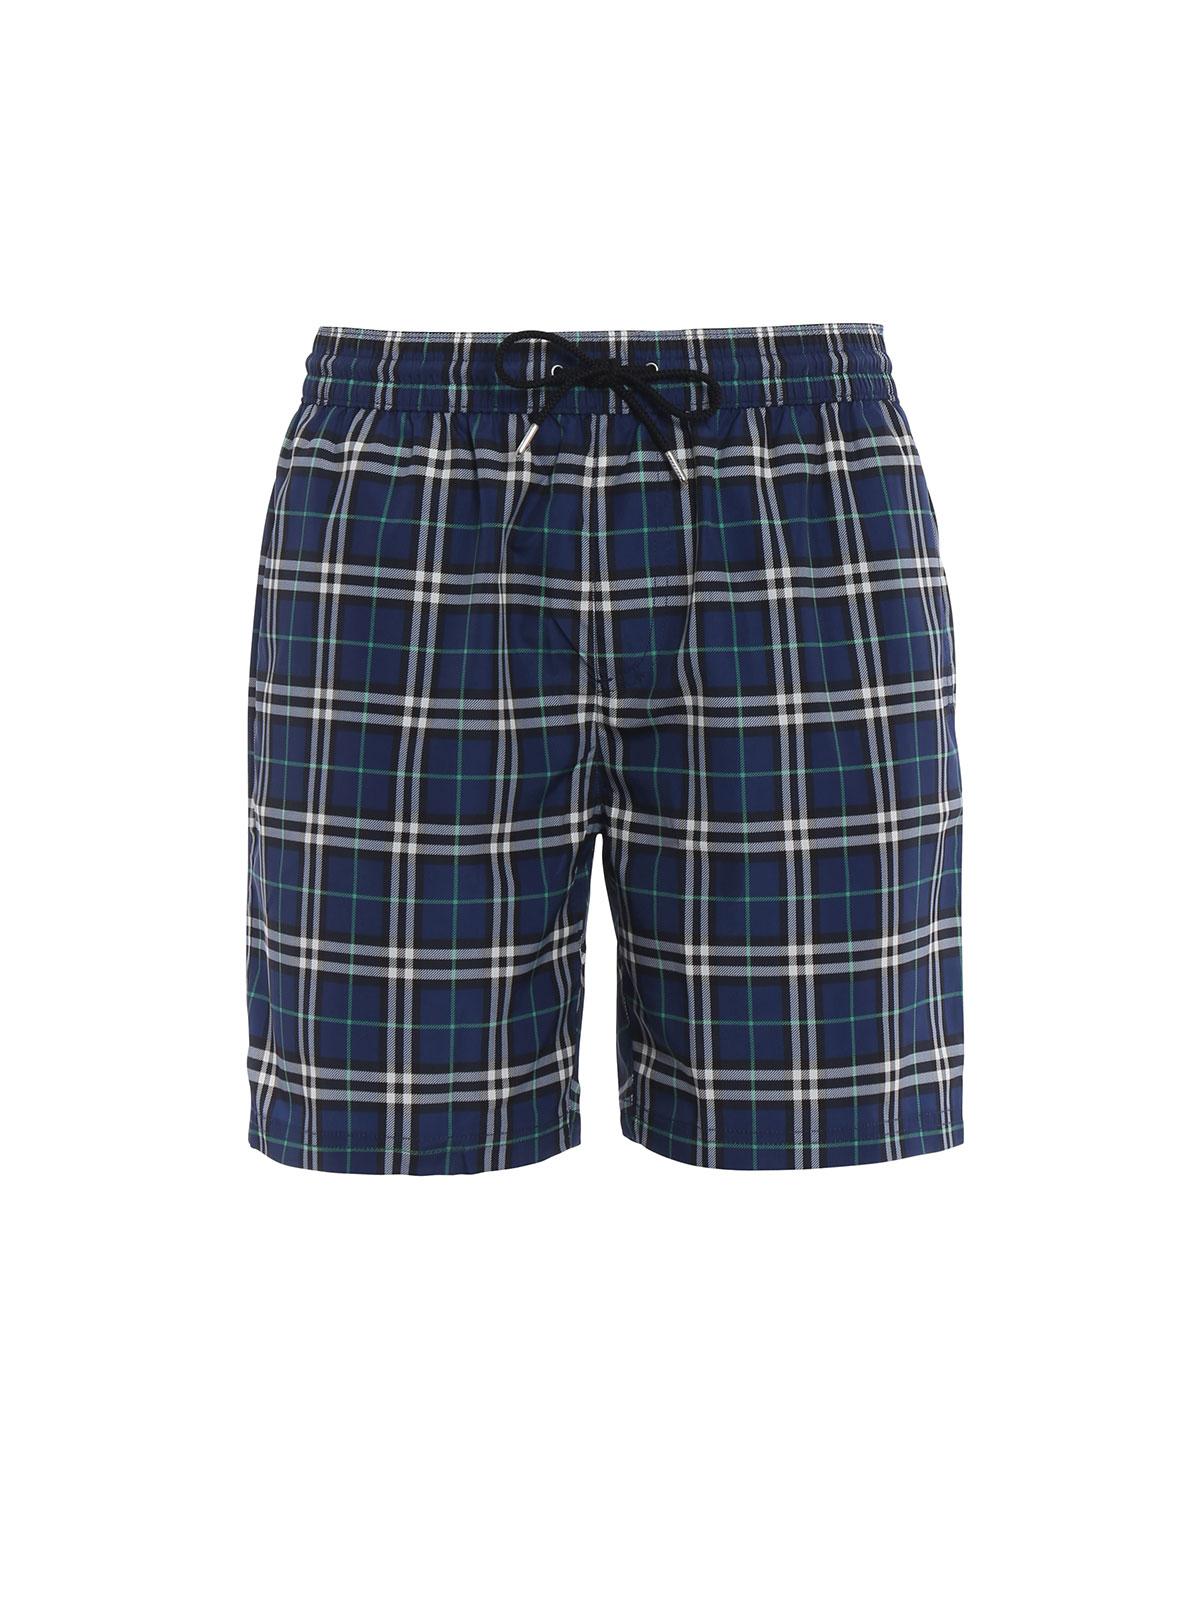 382528265b304 BURBERRY: Swim shorts & swimming trunks - Guildes blue Check swim shorts